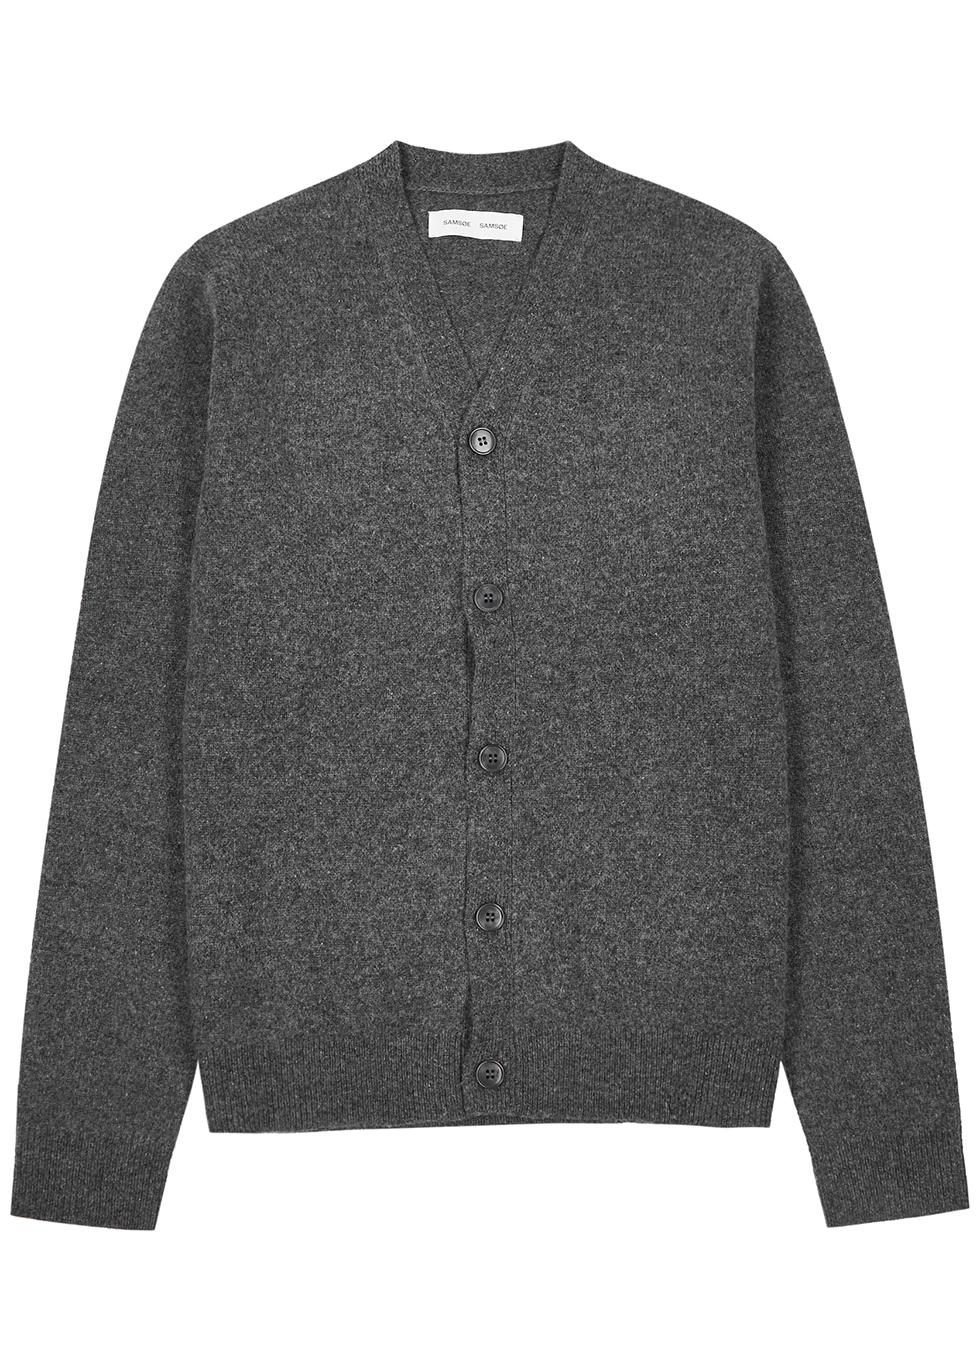 Corno grey wool cardigan